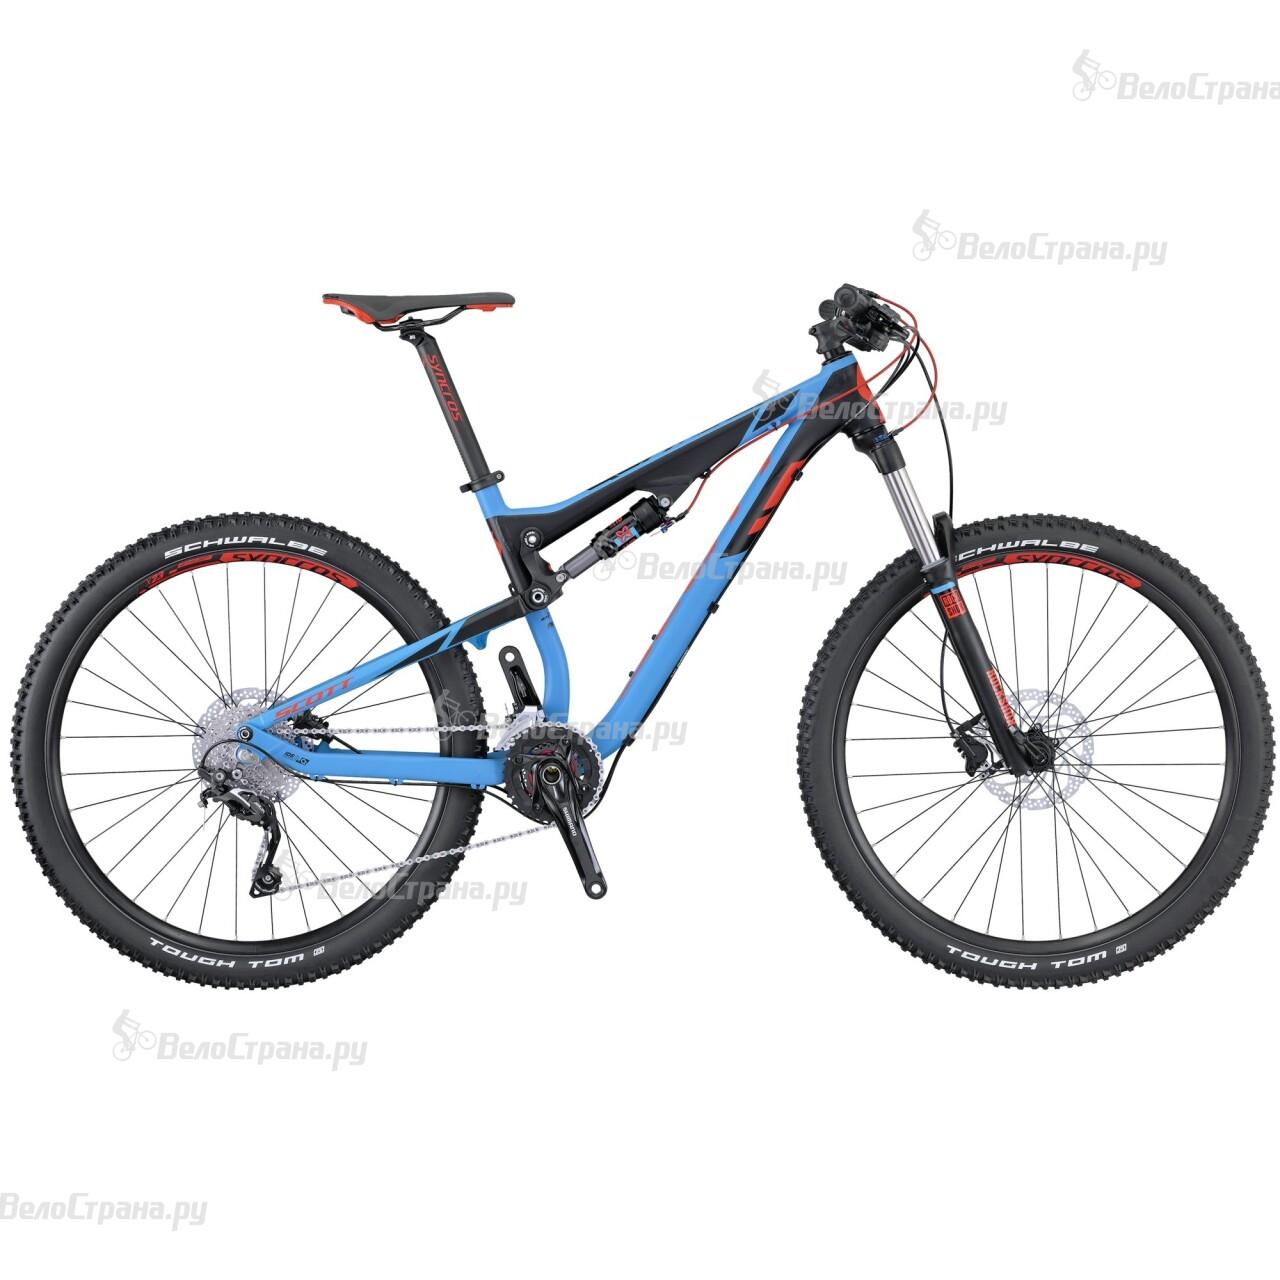 Велосипед Scott Genius 950 (2016) велосипед scott genius lt 700 tuned plus 2016